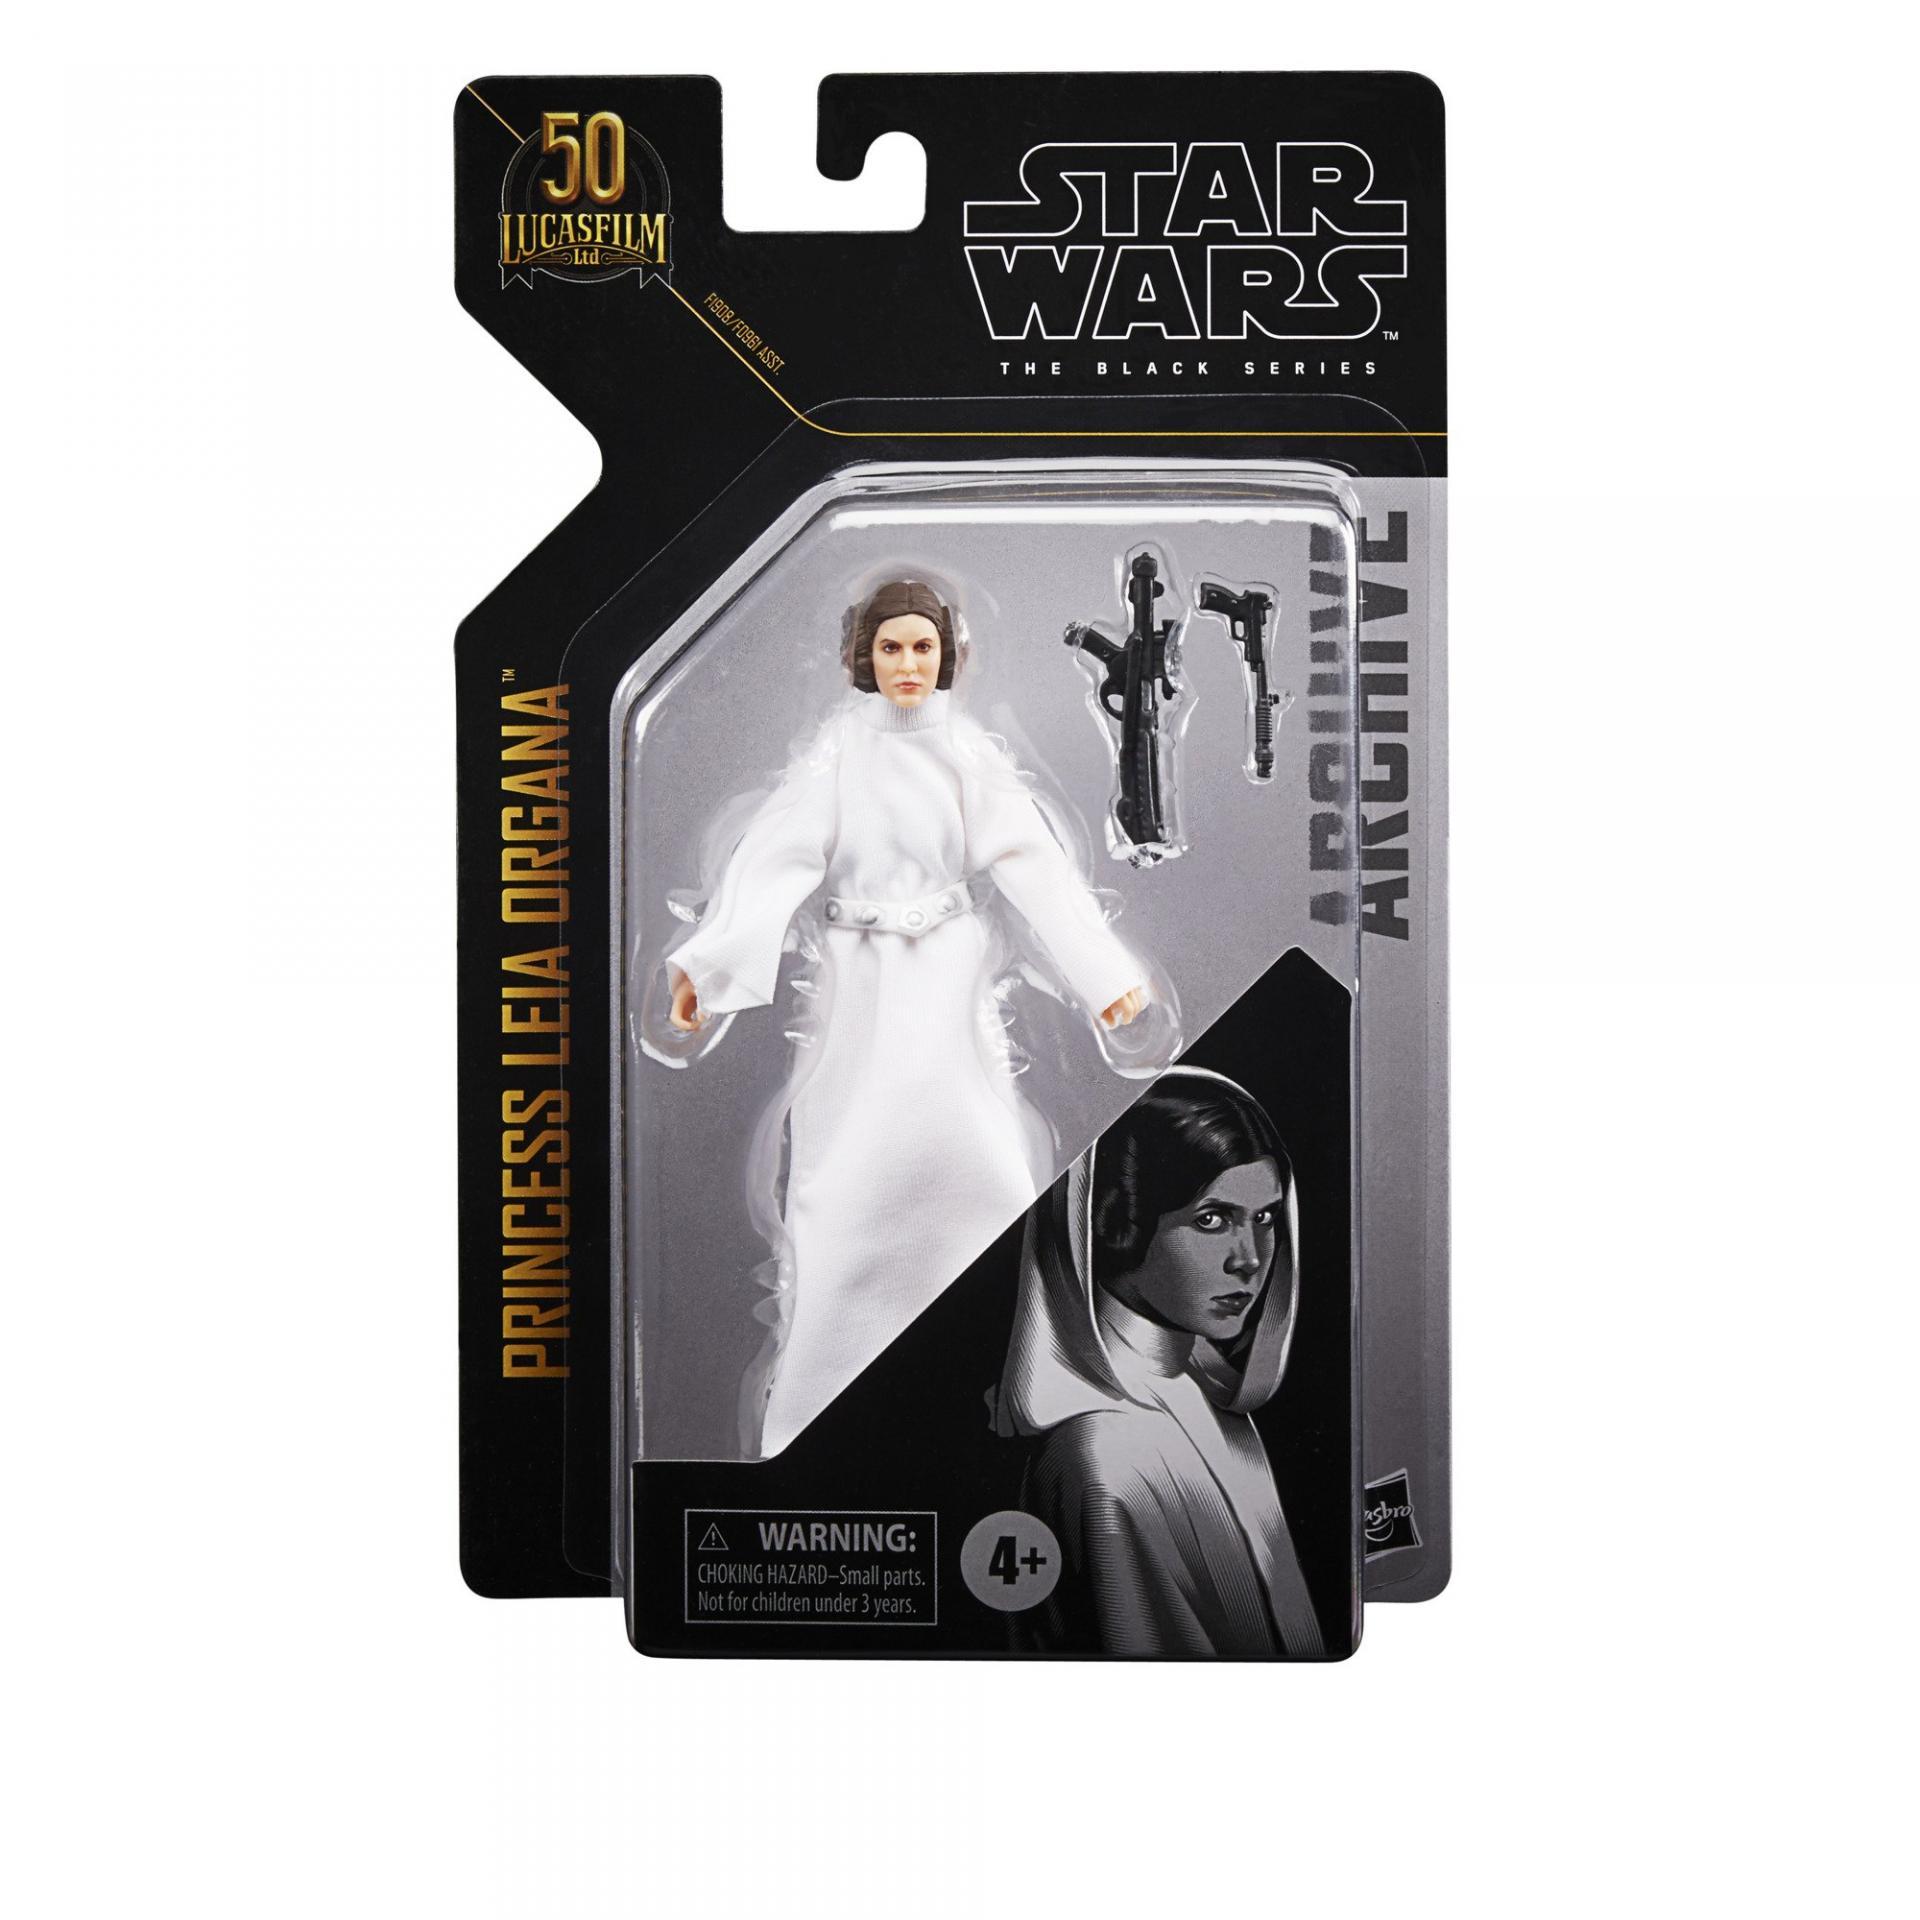 Star wars the black series archive princess leia organa 15cm5